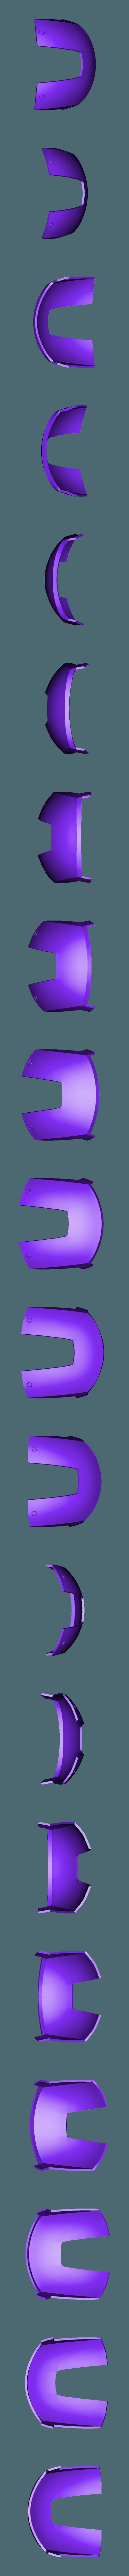 KF_helmet1.stl Download free STL file Iron Man Mark III Helmet Separated and Oriented • 3D printer template, KerseyFabrications